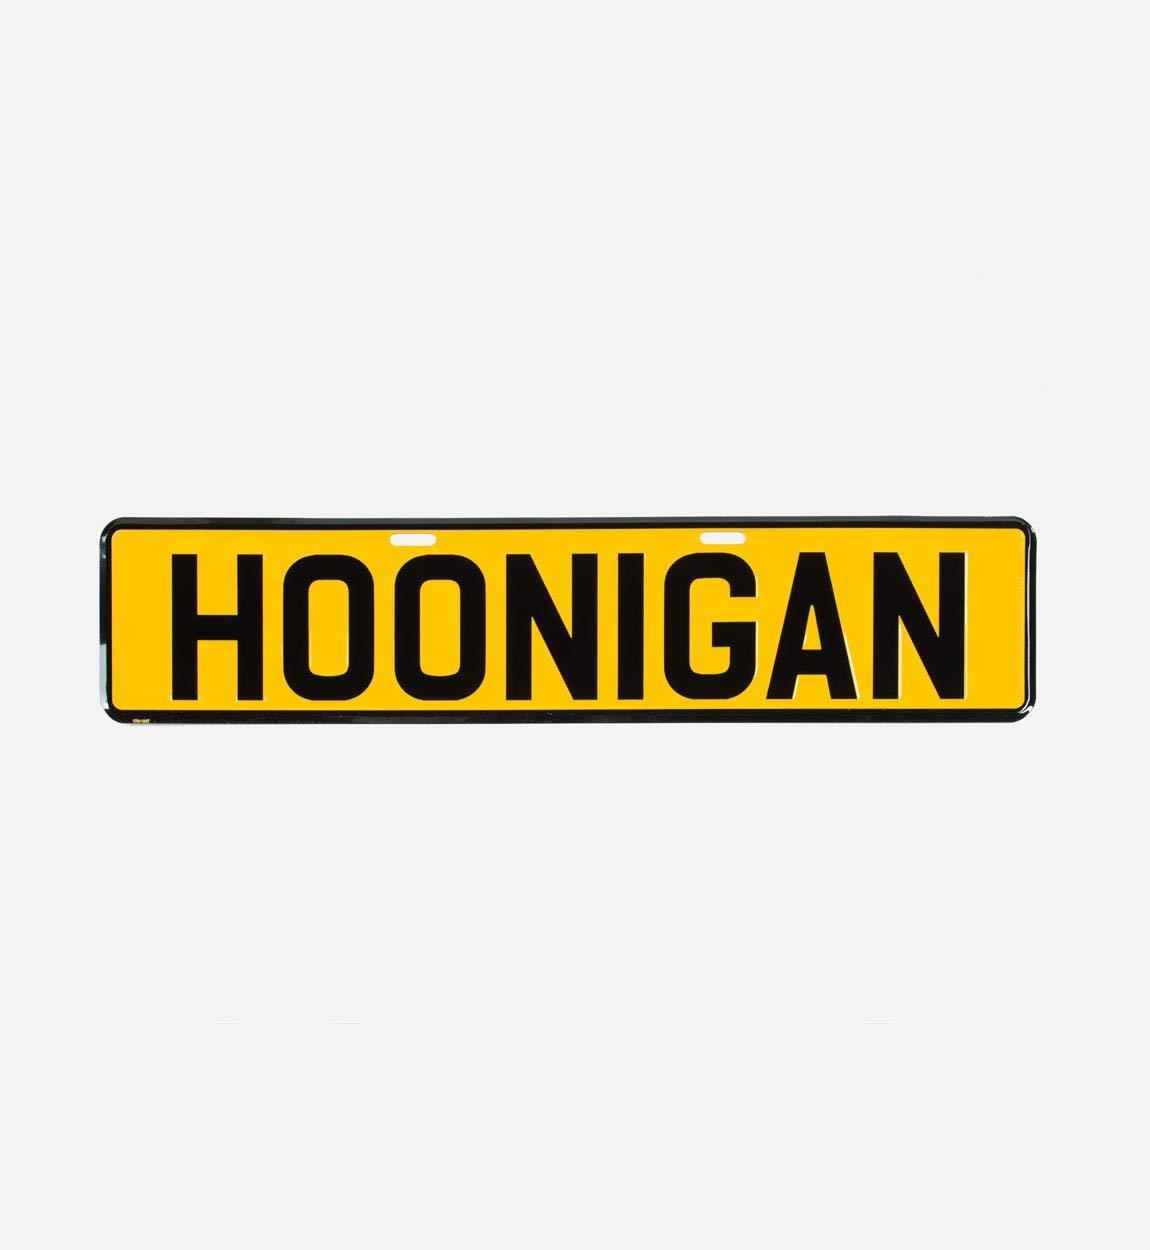 Hoonigan EU License Plate